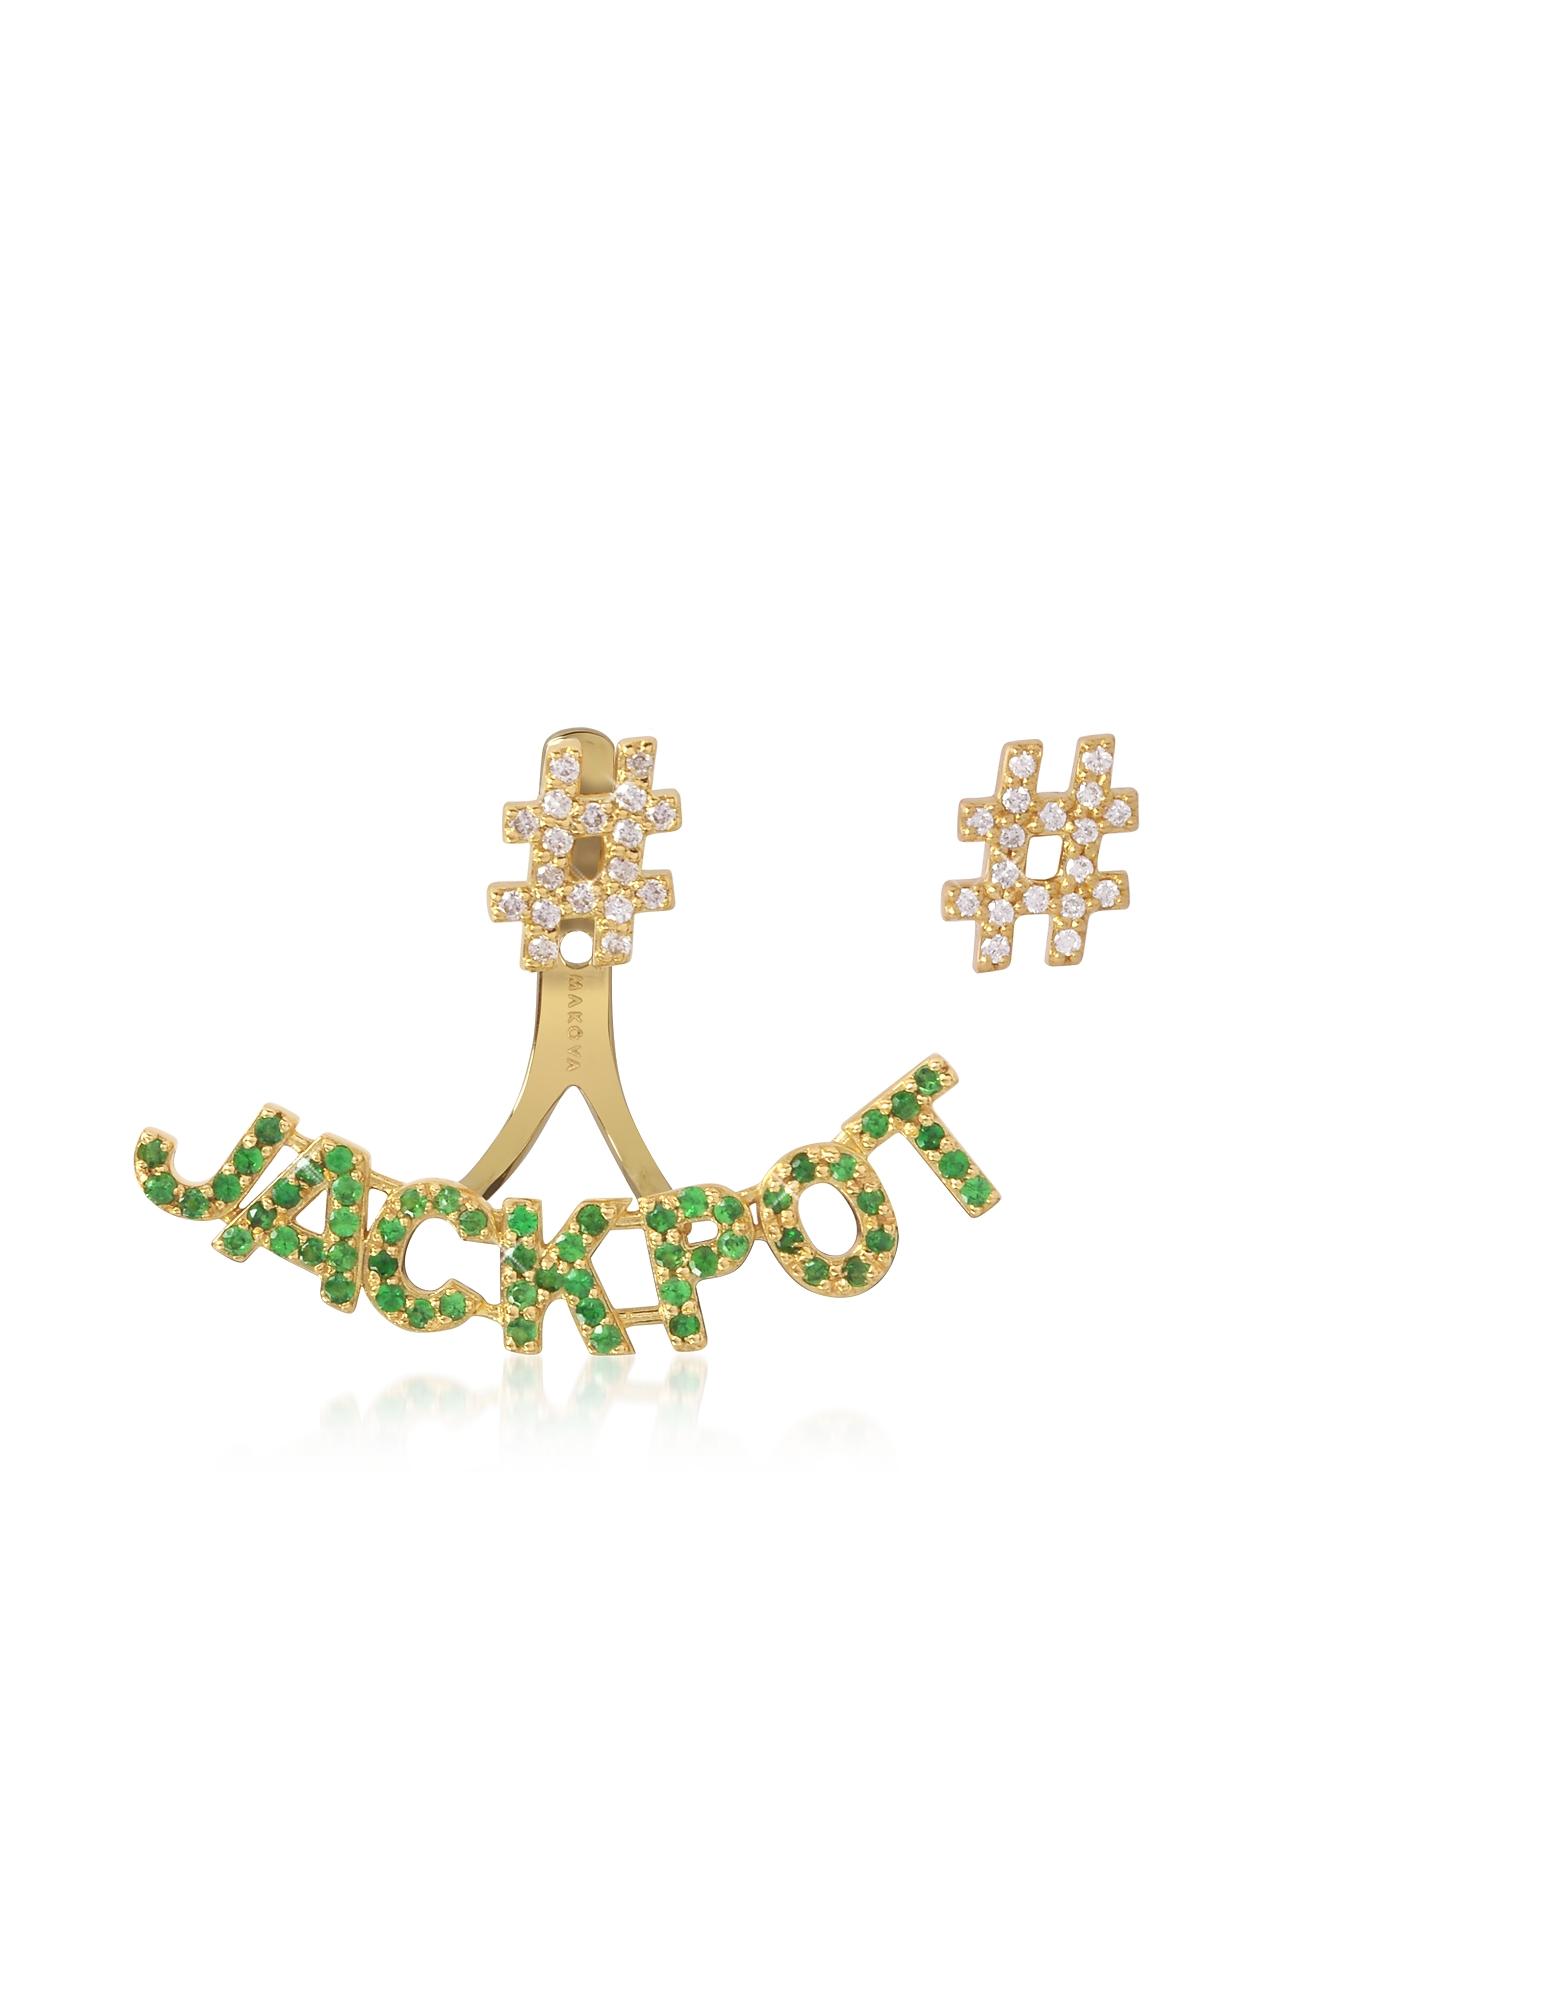 Makova Jewelry 耳环, #Jackpot字母装饰耳钉